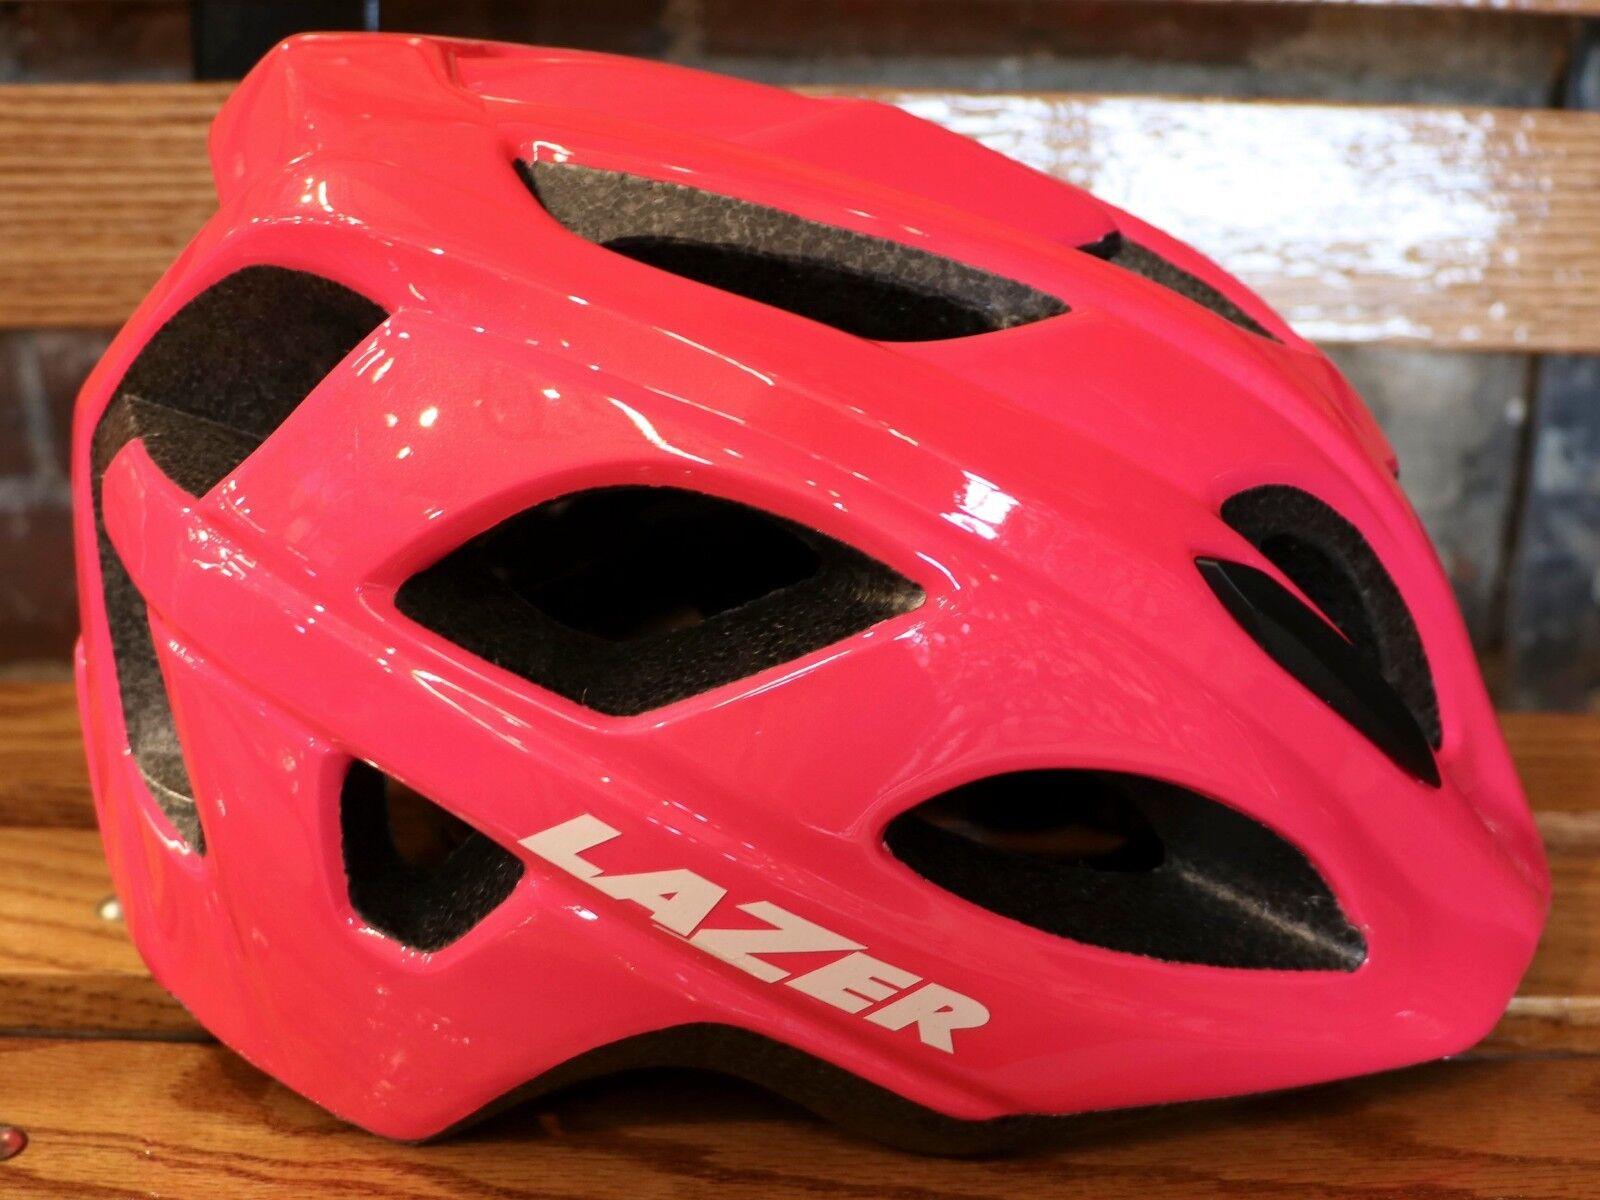 NEW Lazer Nutz Kid's Bike Helmet – color   Neon Pink   Size  Kid (50-56 cm.)  guaranteed